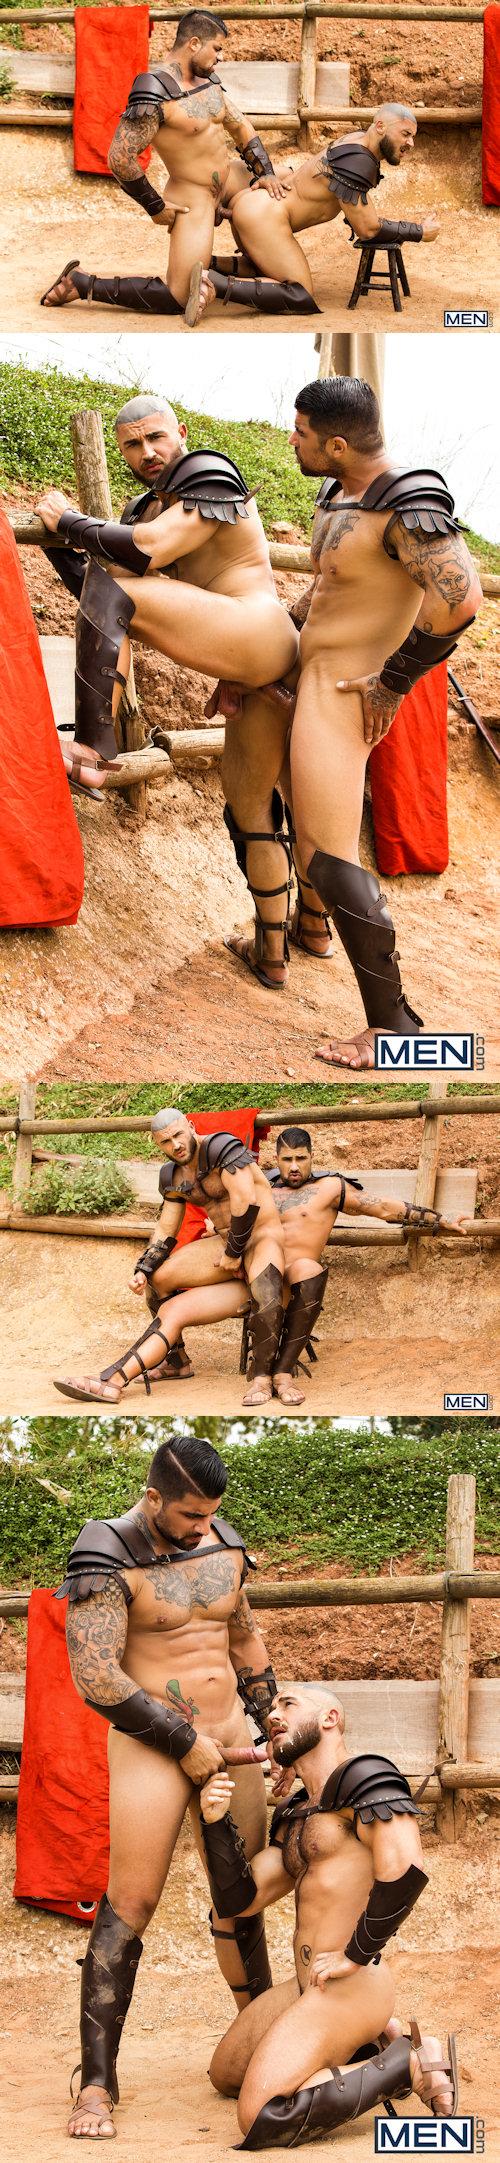 men-francois-sagat-ryan-bones-2.jpg